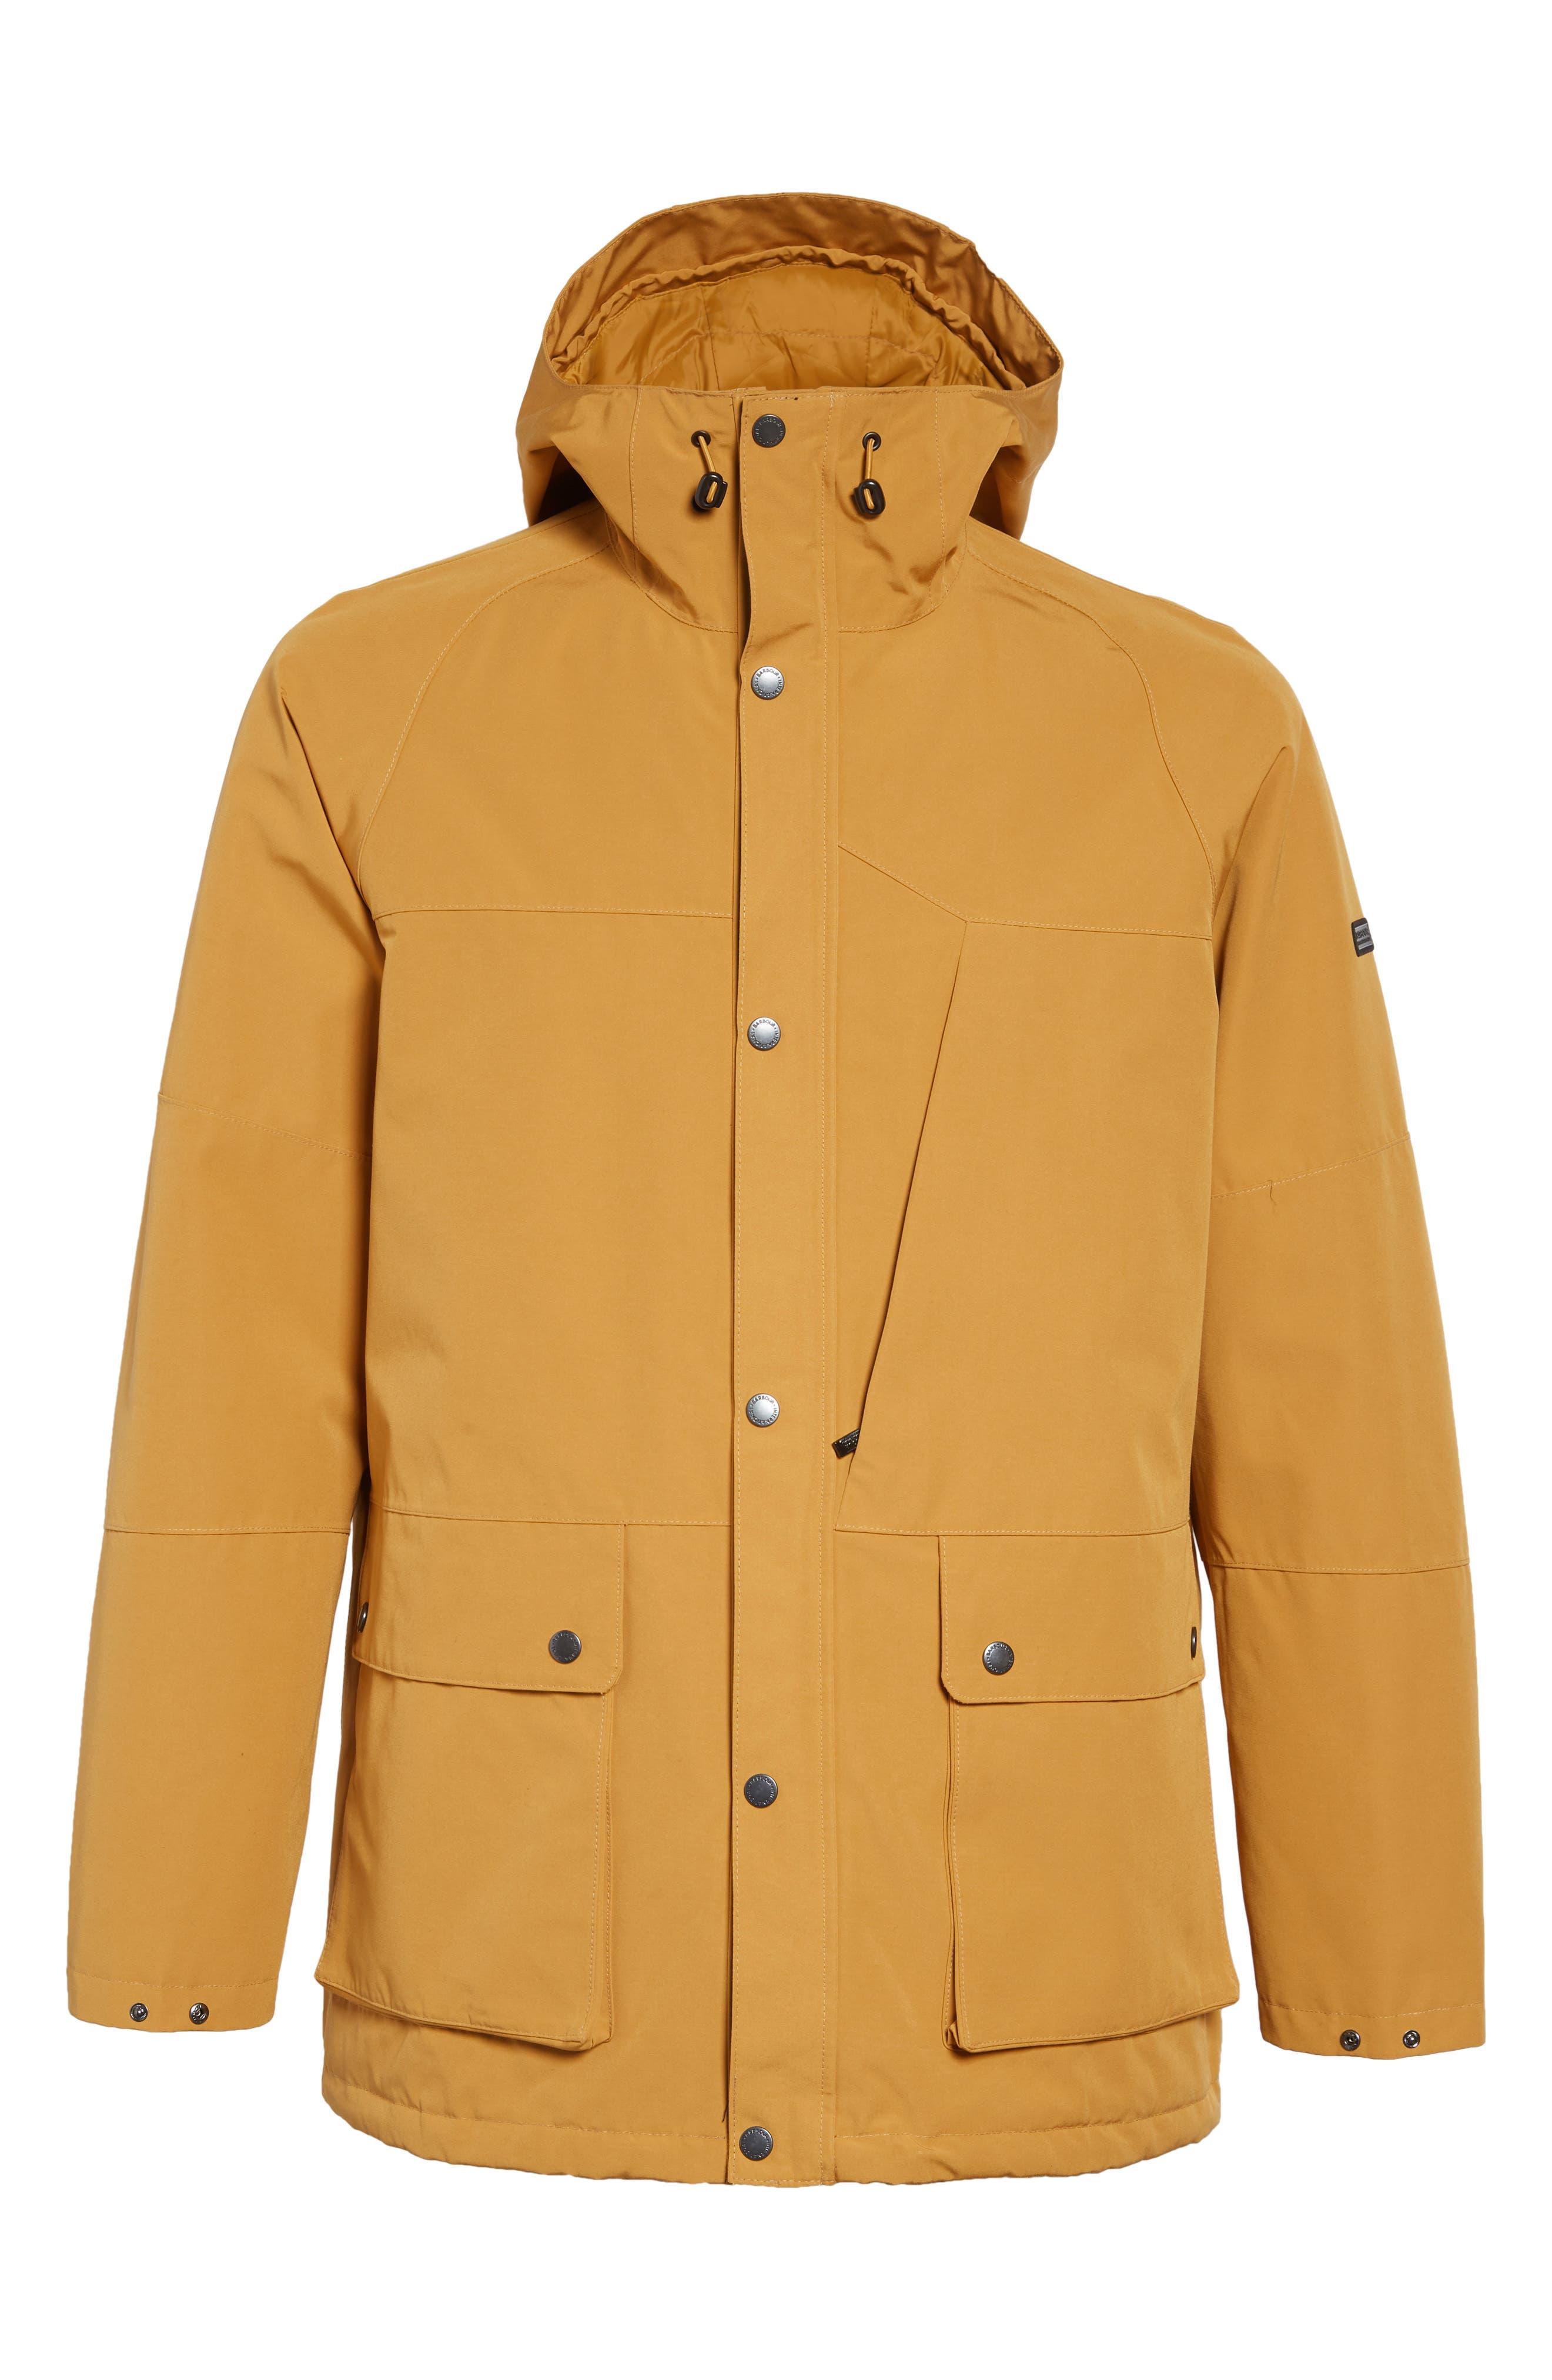 BARBOUR, Bi-Ridge Waterproof Hooded Jacket, Alternate thumbnail 5, color, YELLOW